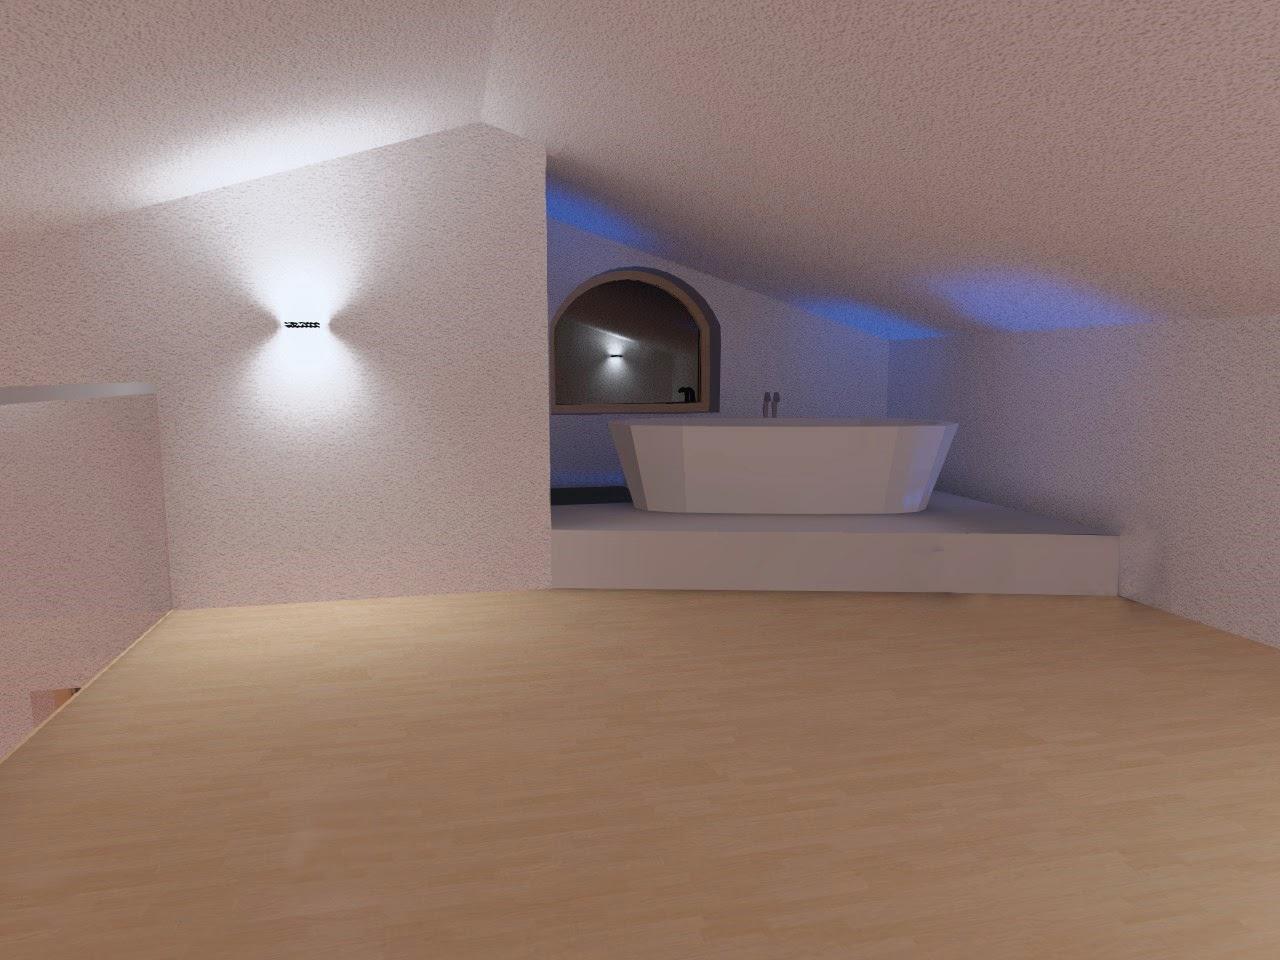 illuminazione moderna luce led : Illuminazione Moderna Bagno : Led Bagno: Luce led palermo - progetti ...